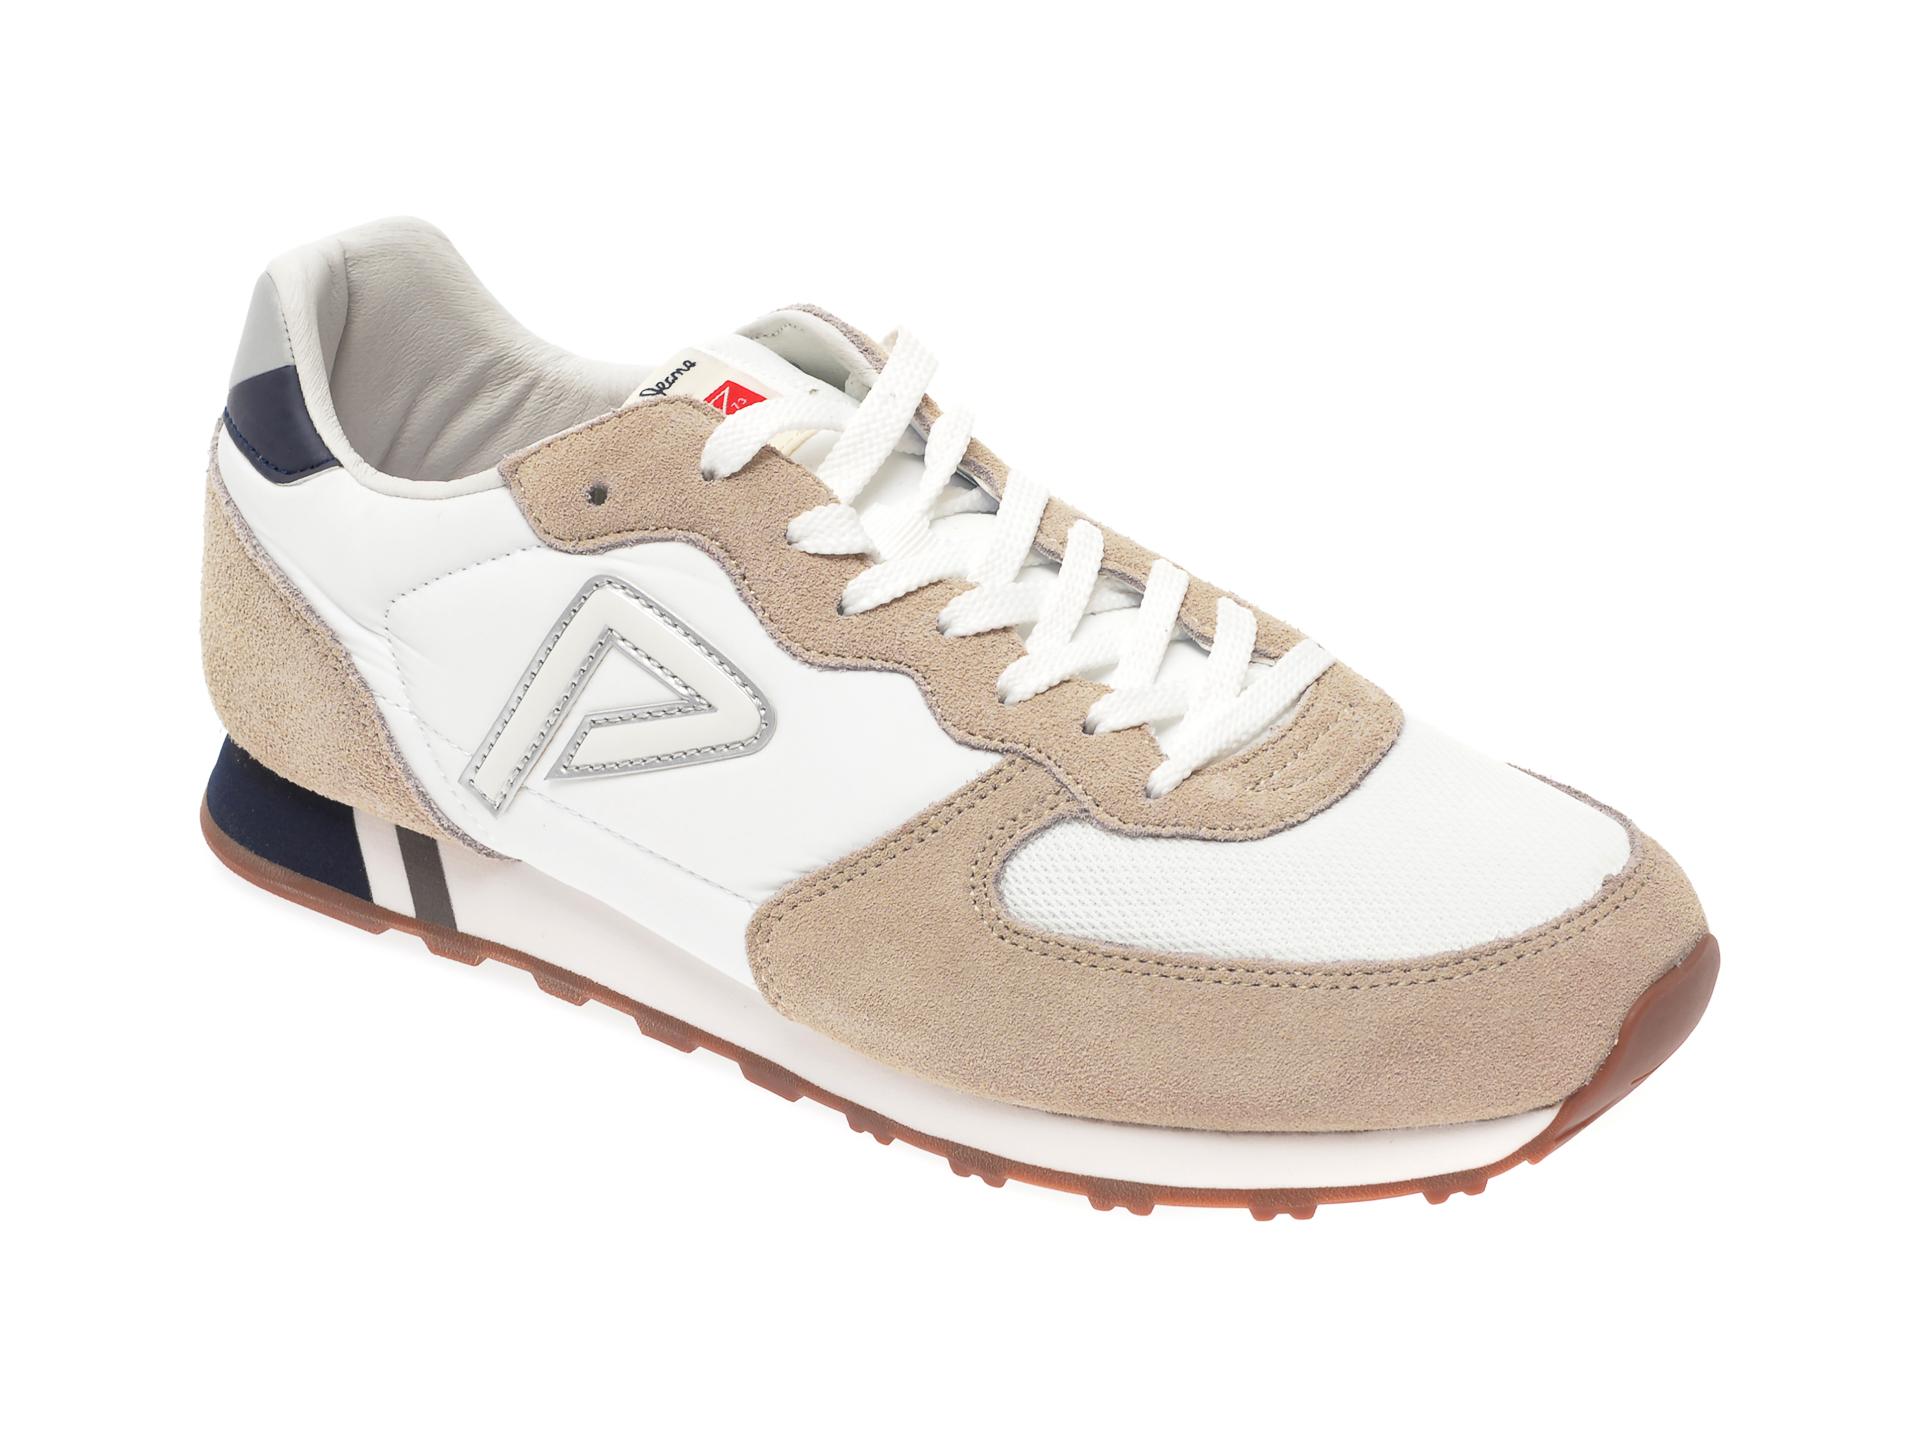 Pantofi sport PEPE JEANS albi, MS30610, din material textil si piele intoarsa imagine